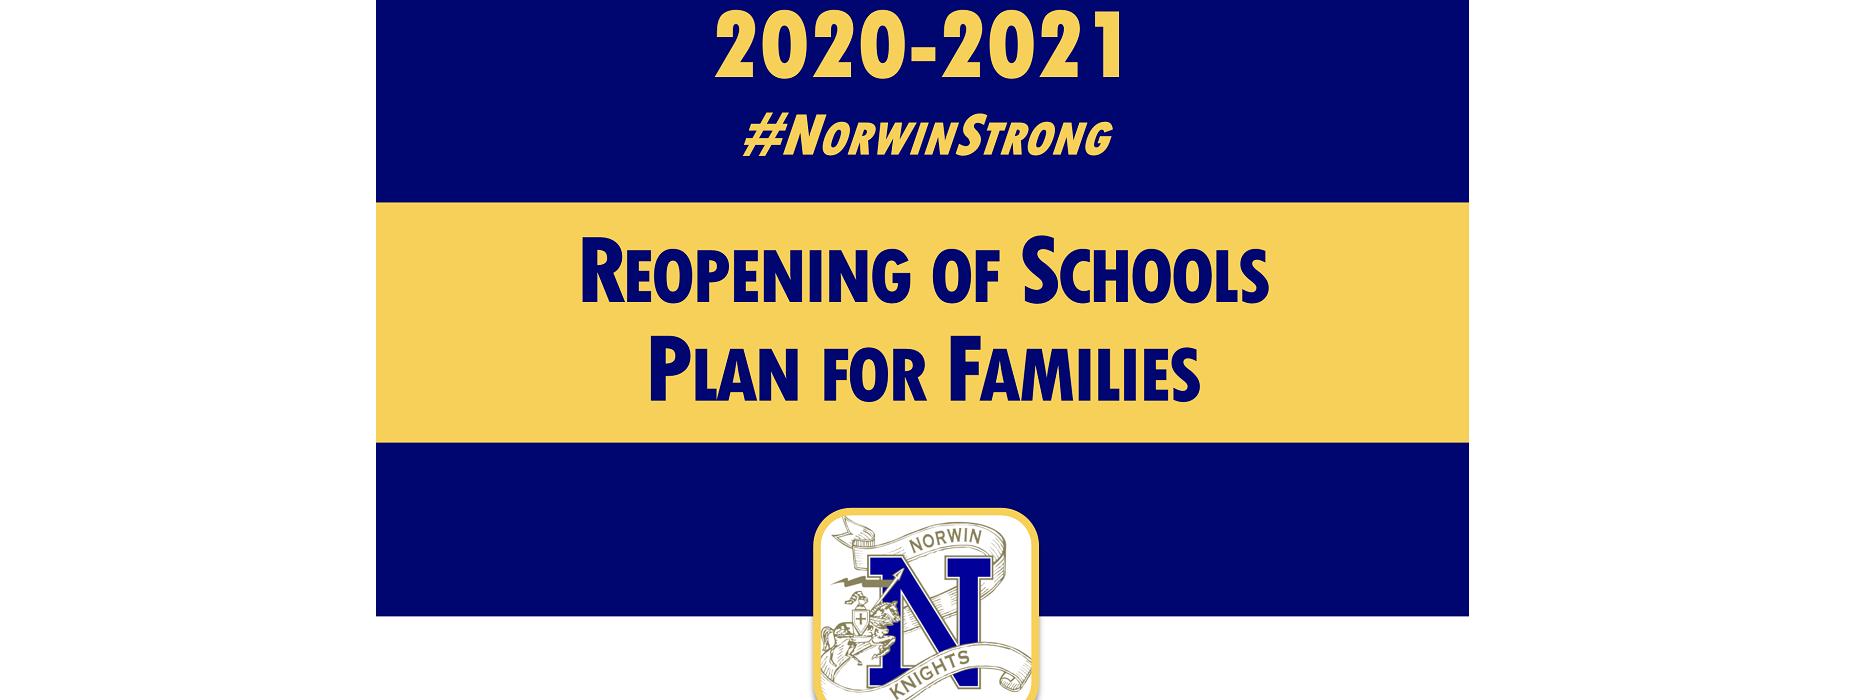 Reopening of Schools Plan